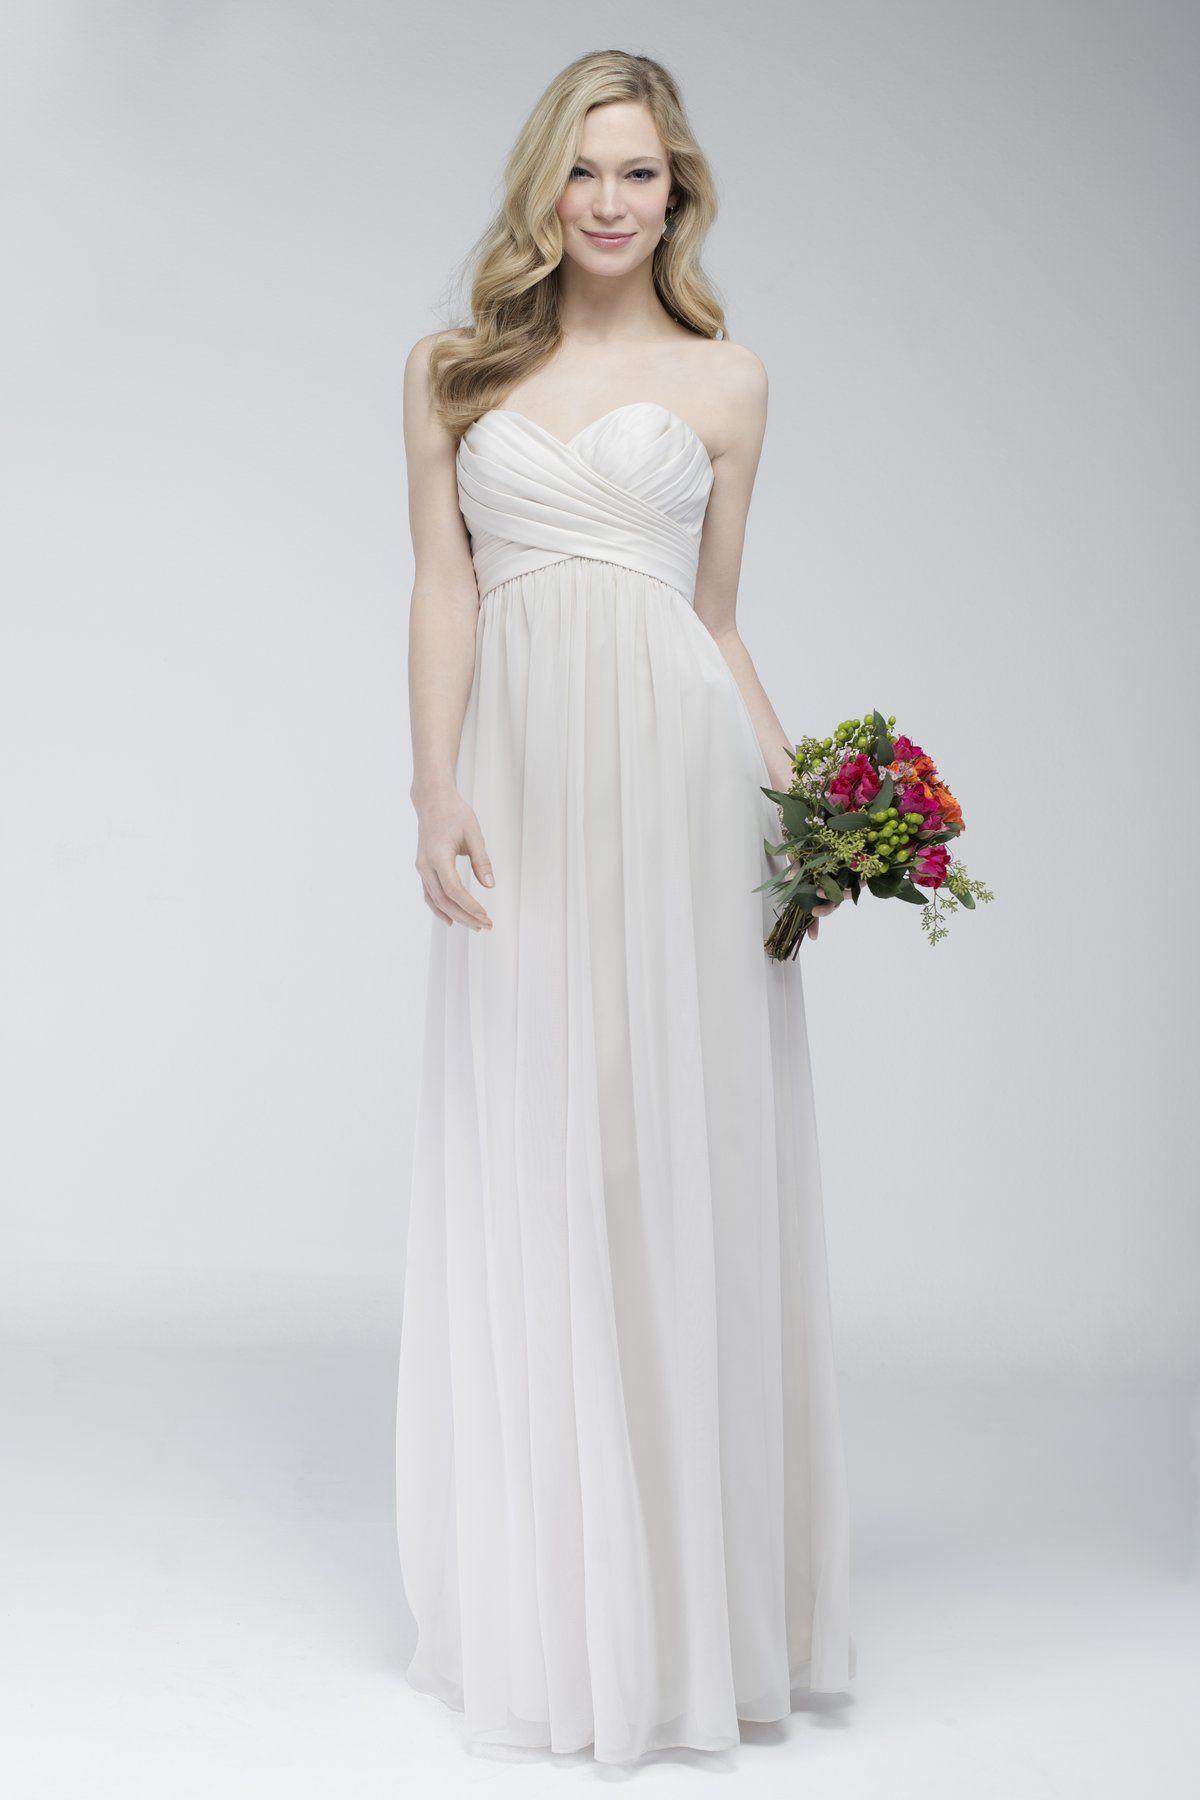 Wtoo maids dress 770 bridesmaid dresses pinterest maids wtoo maids dress 770 maternity bridesmaid ombrellifo Choice Image